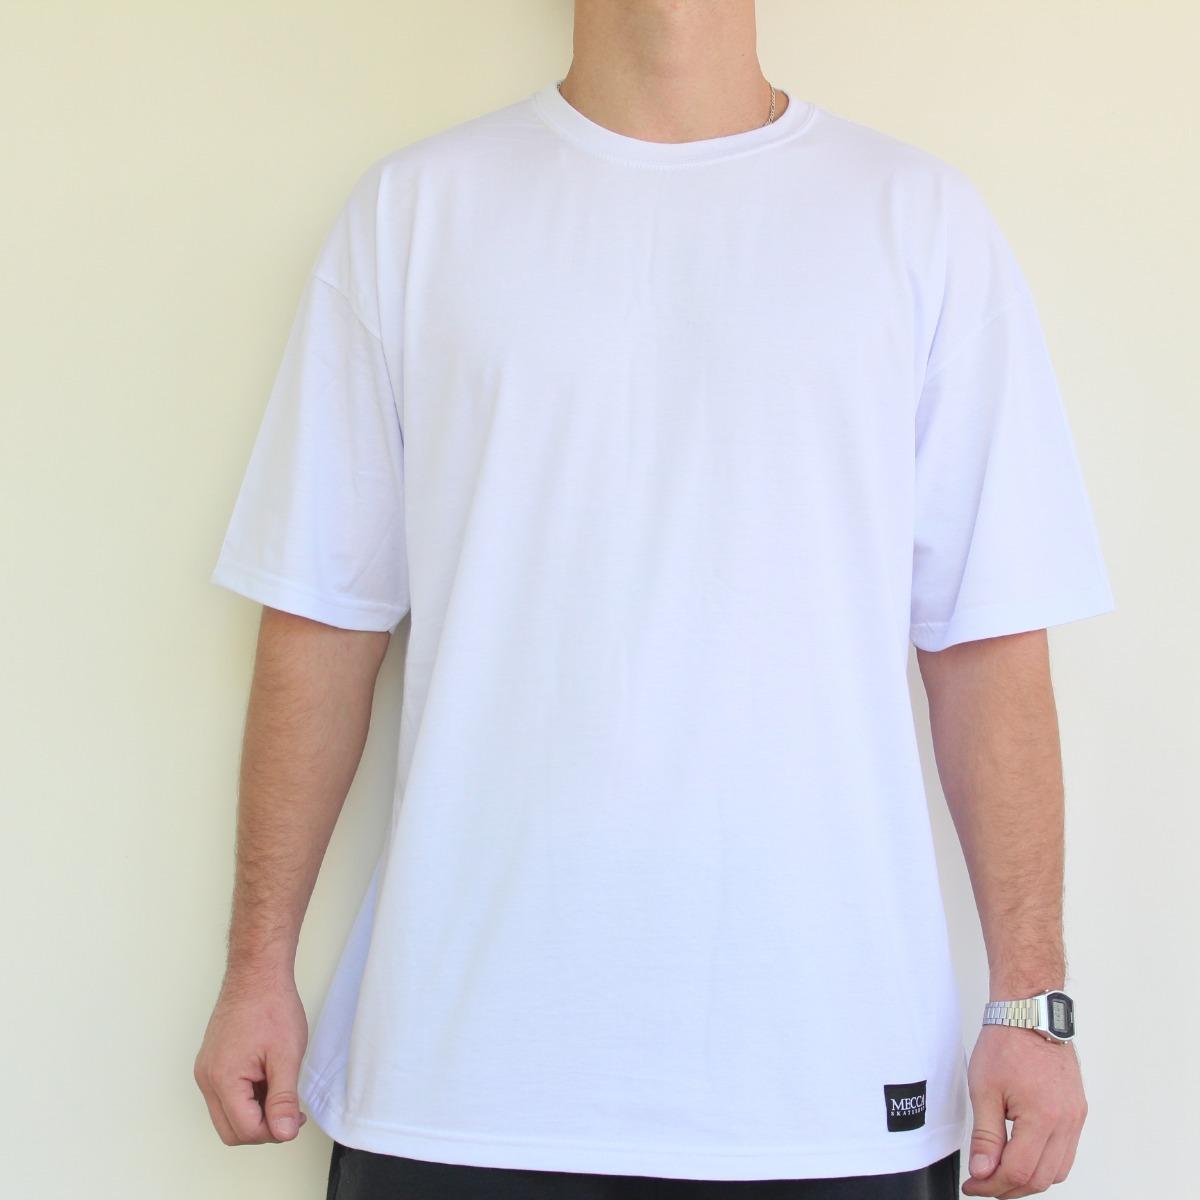 dbad83b5aa camiseta plus size manga curta camiseta lisa tamanho grande. Carregando  zoom.